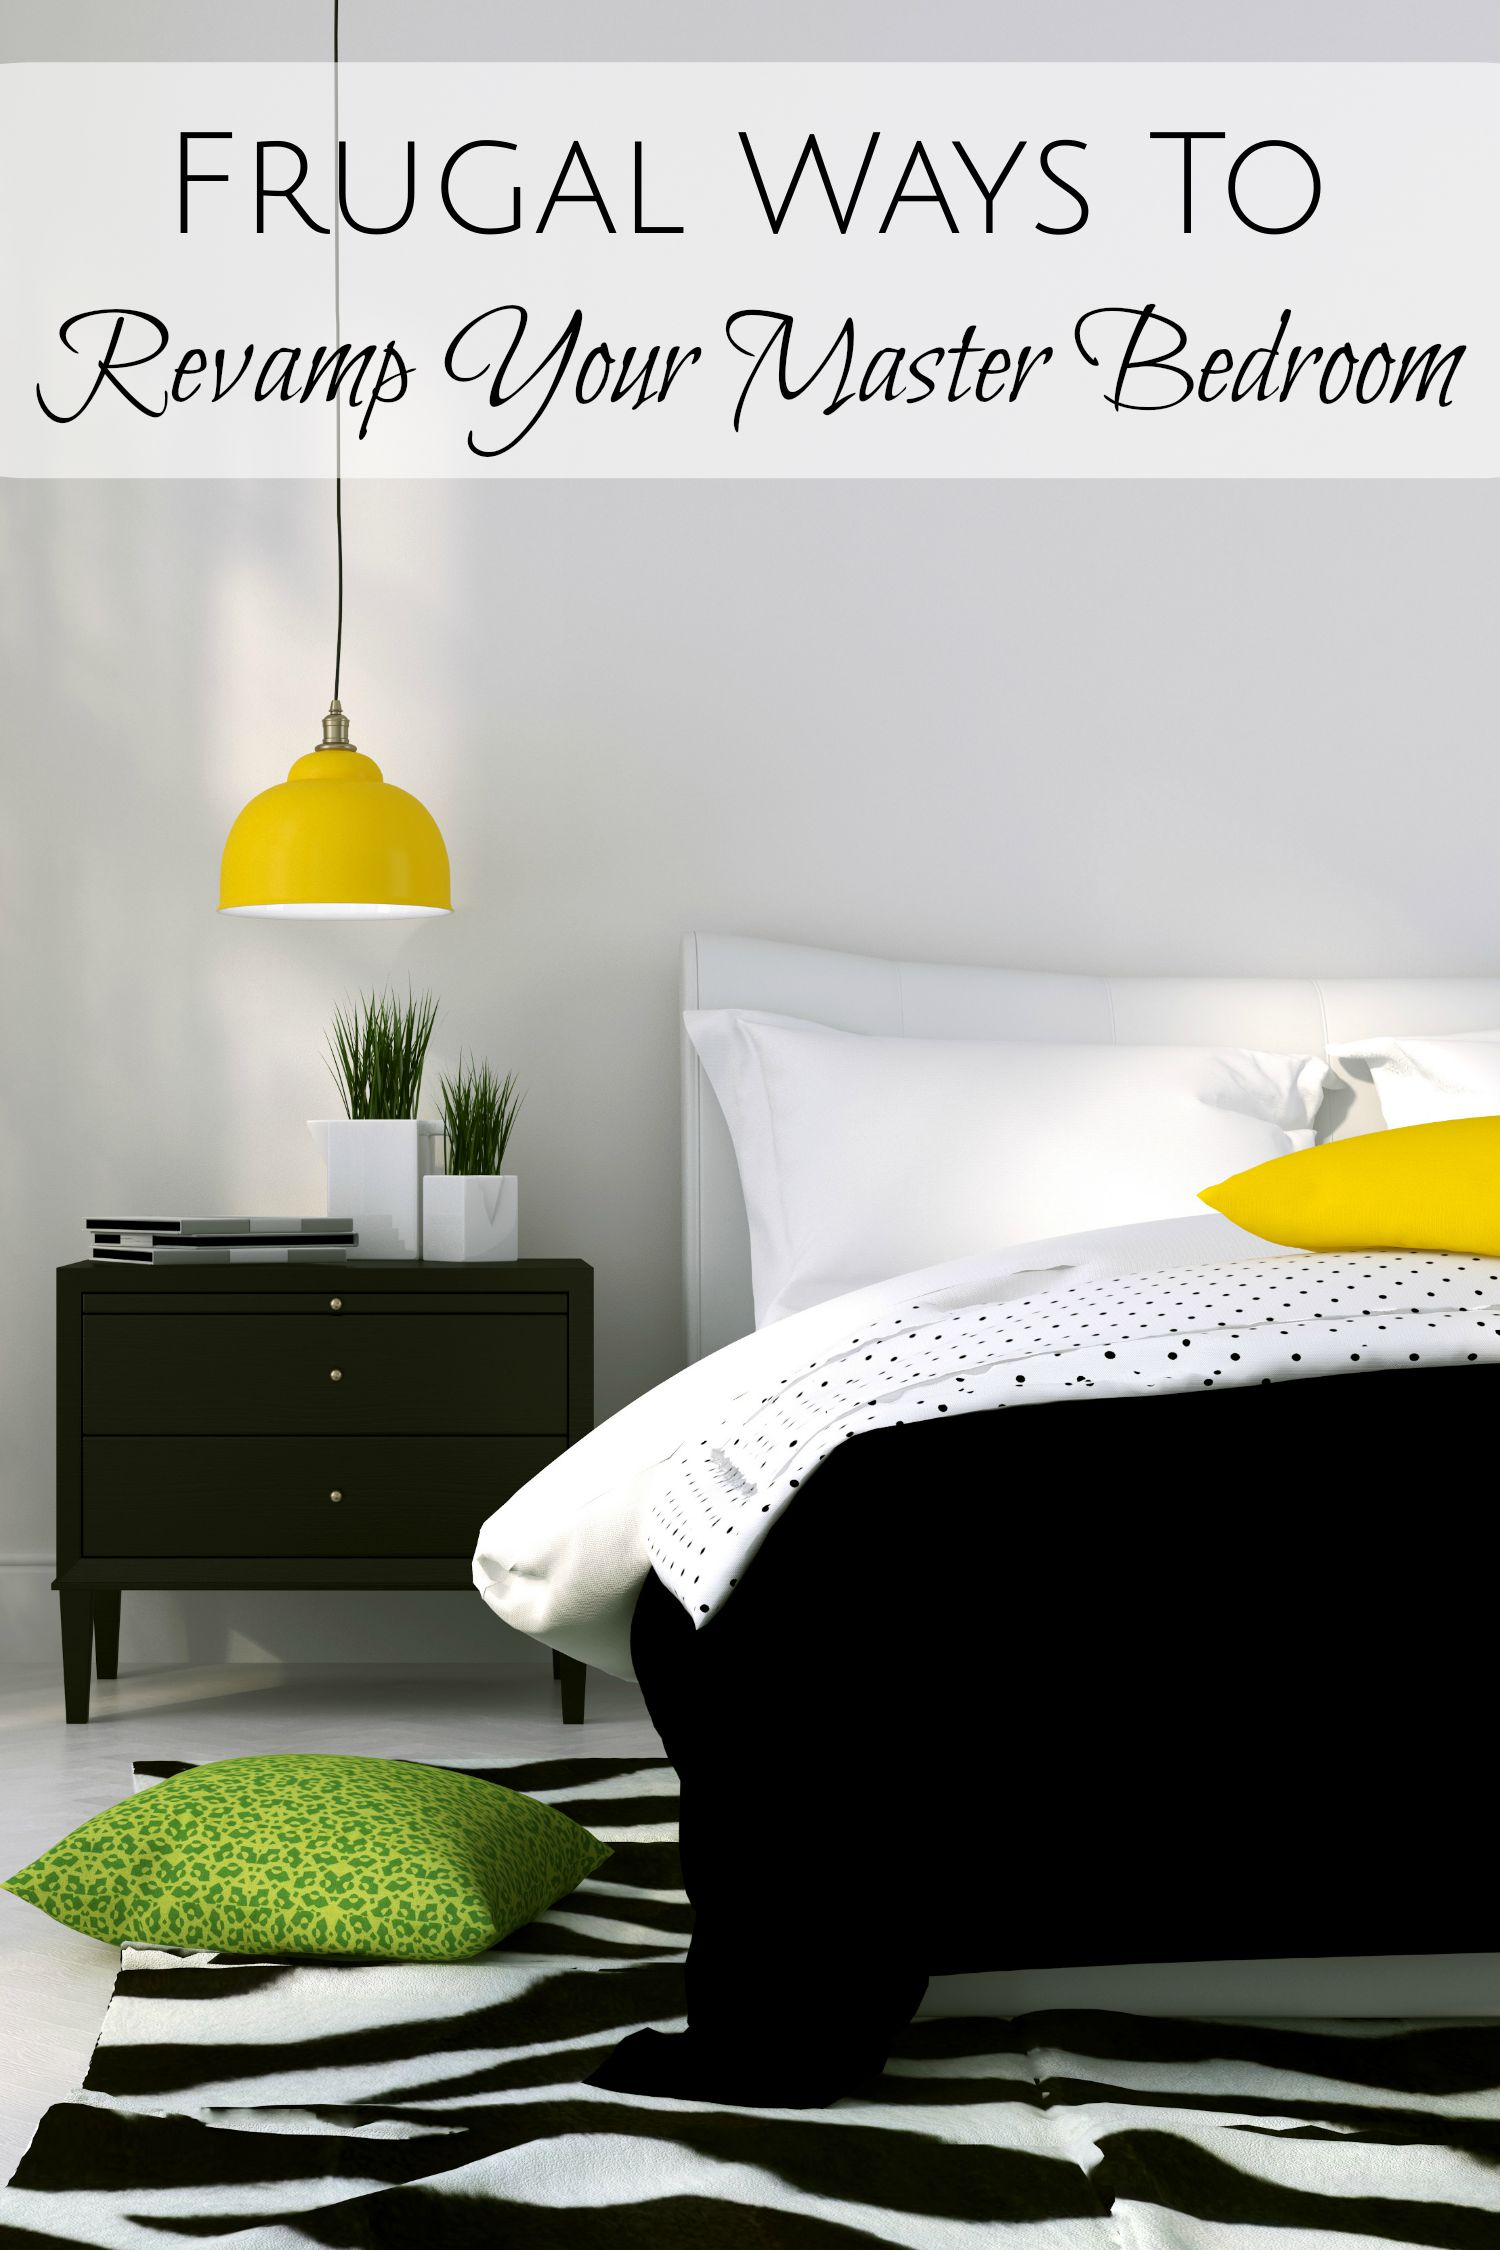 Frugal Ways To Revamp Your Master Bedroom